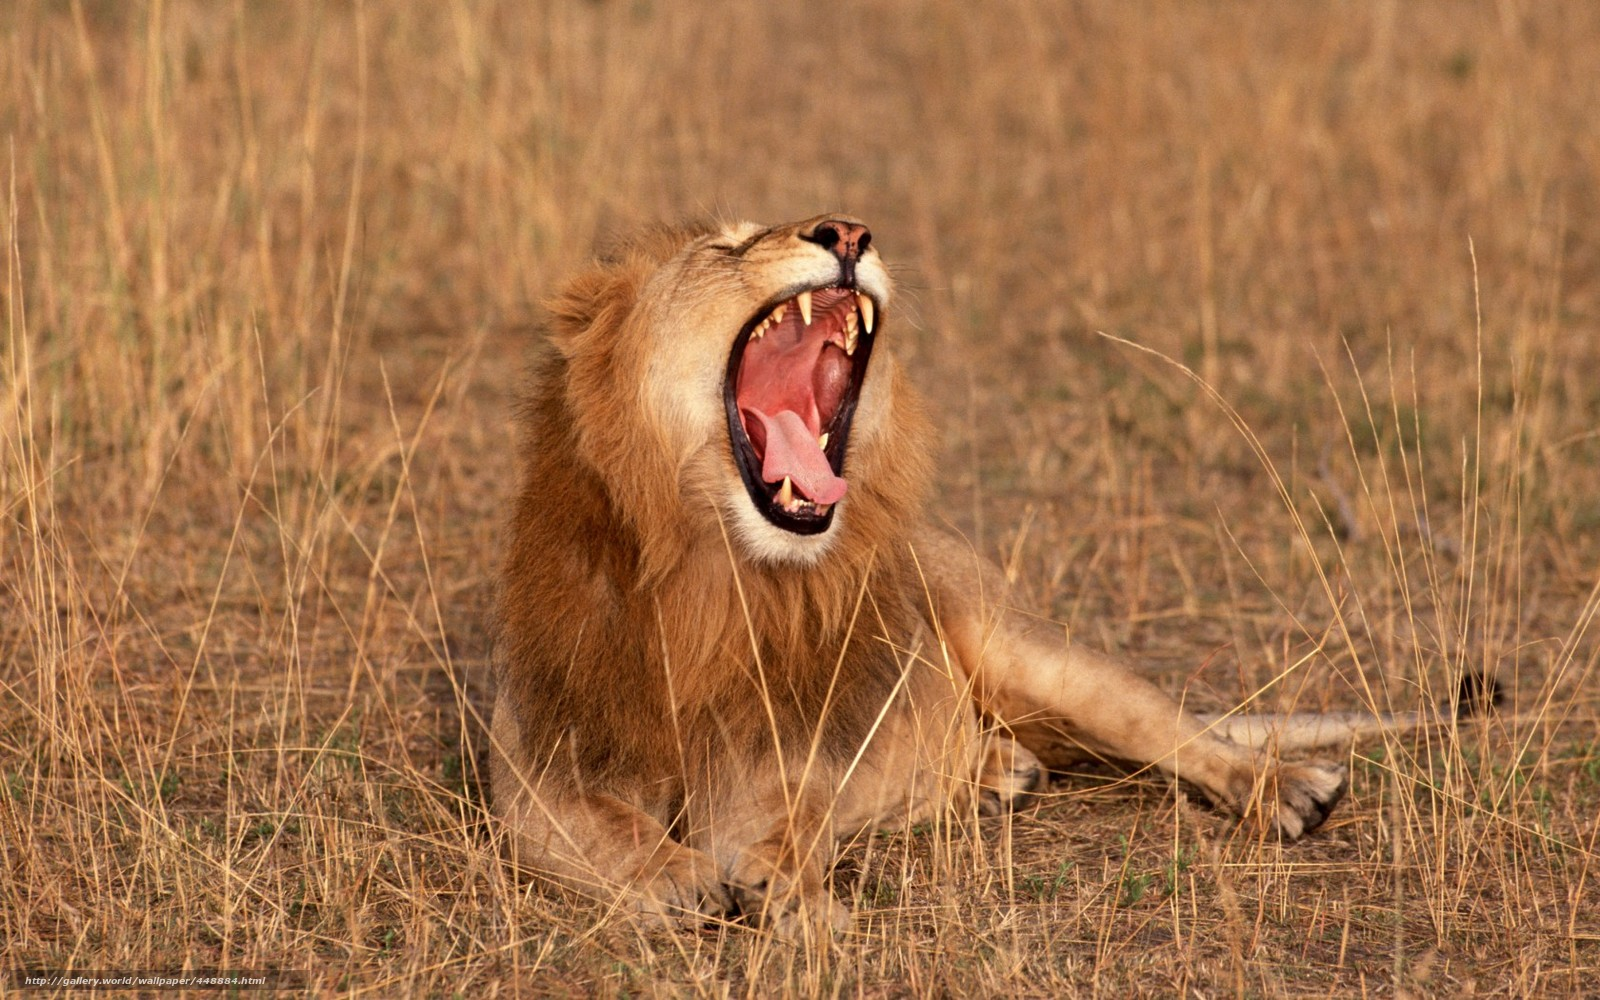 Scaricare gli sfondi africa leone savana animali sfondi for Sfondi leone